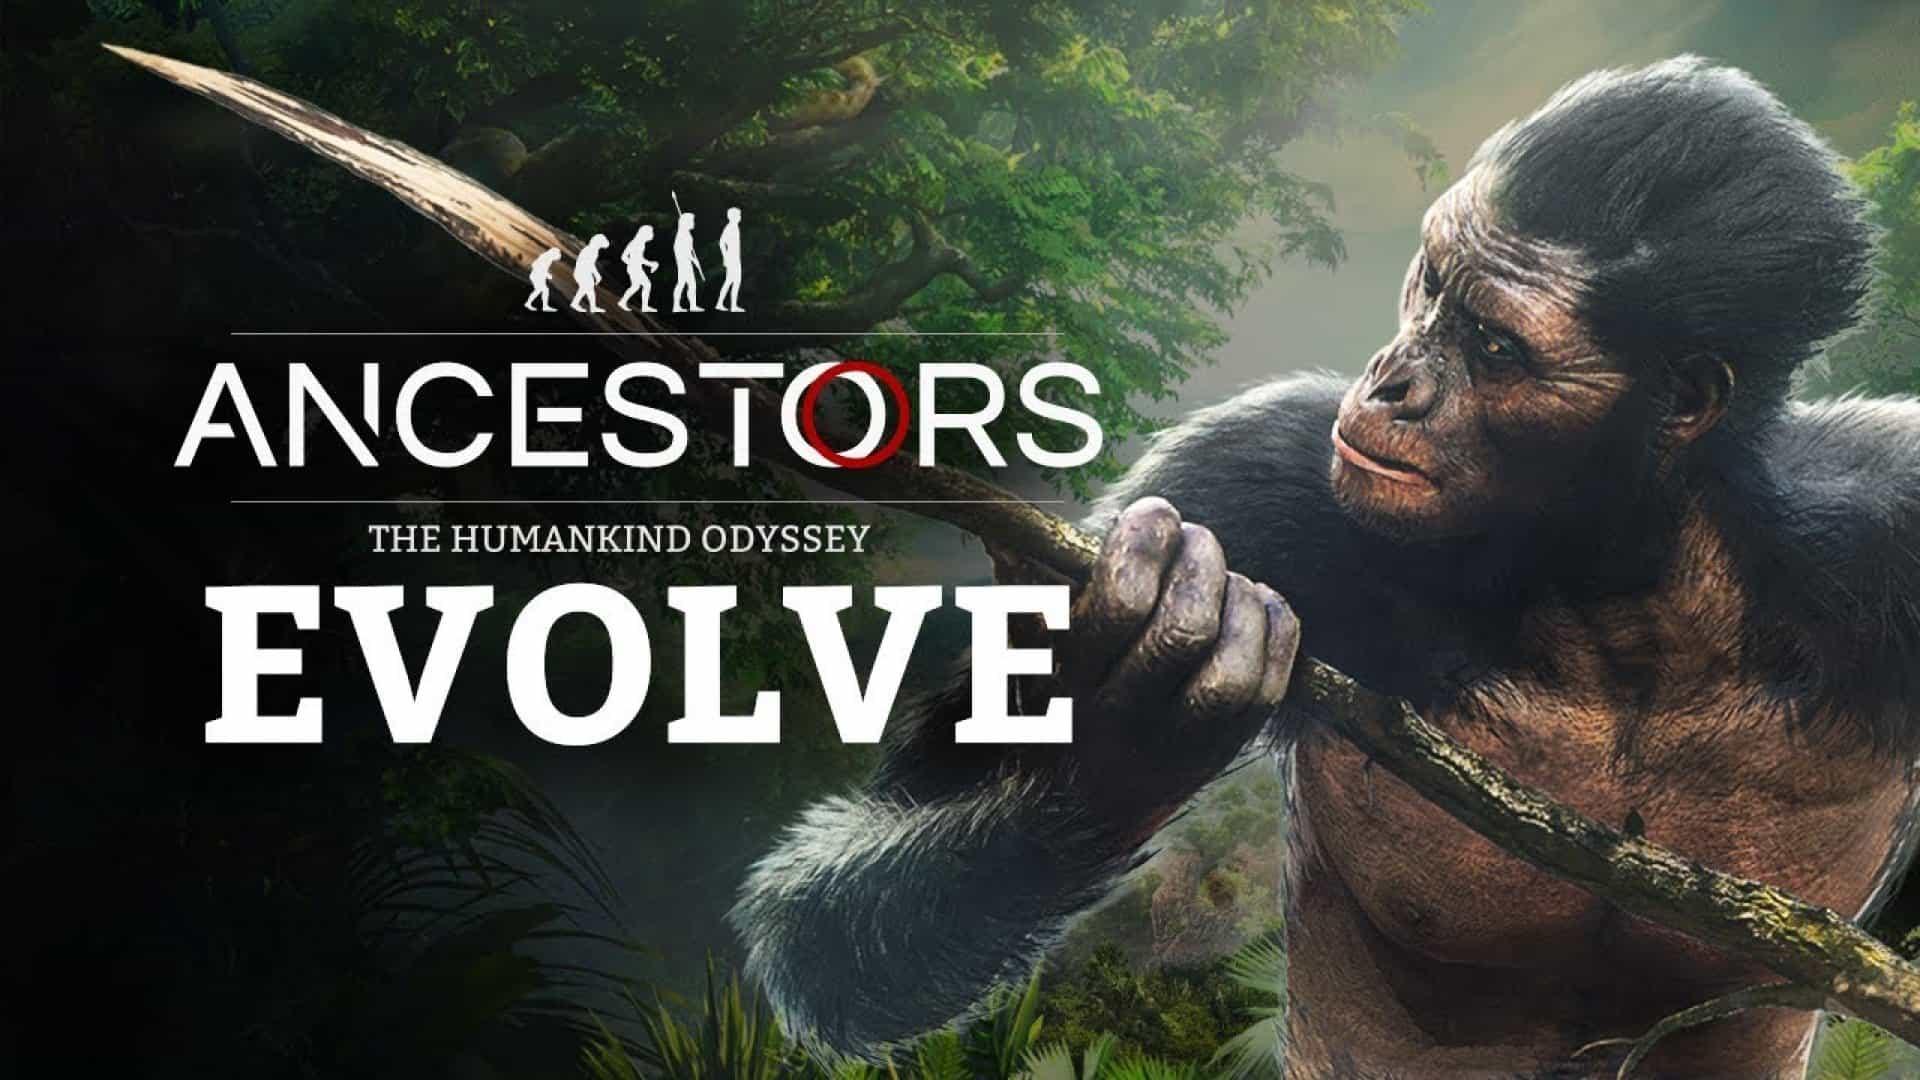 Ancestors: The Humankind Odyssey – 101 Trailer Episode 3: Evolve